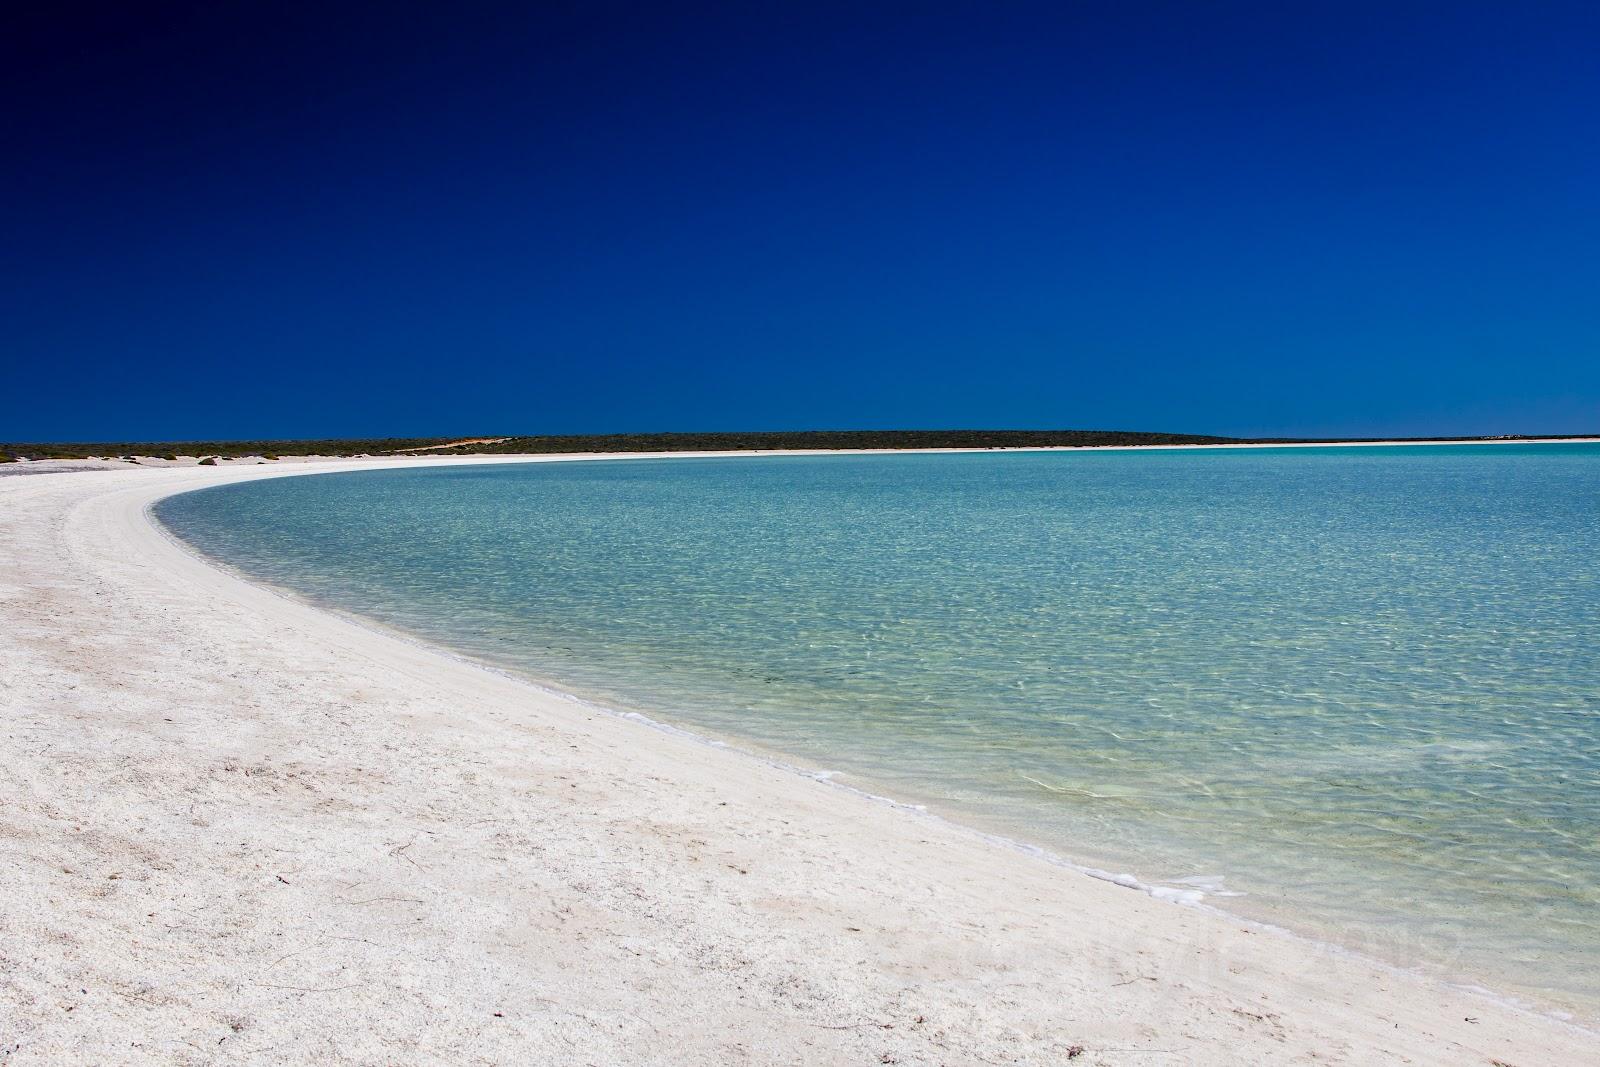 A Trip to Shark Bay & Monkey Mia in Western Australia